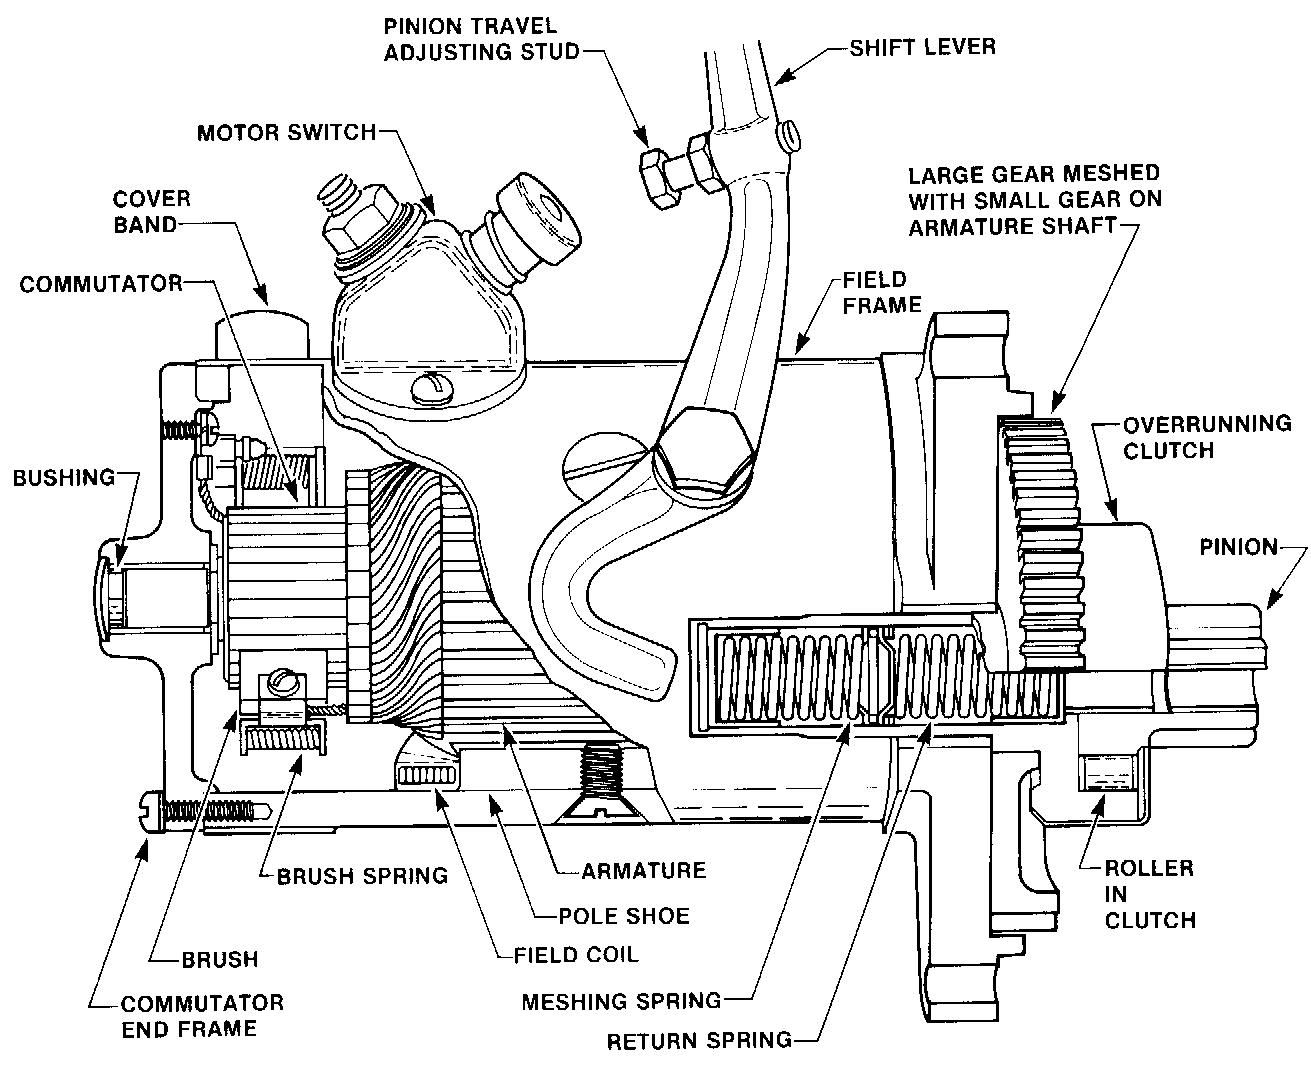 starter pinion gear schematic wiring library 10 tooth starter pinion gear harley-davidson cutaway view of an aircraft starter using a bendix drive